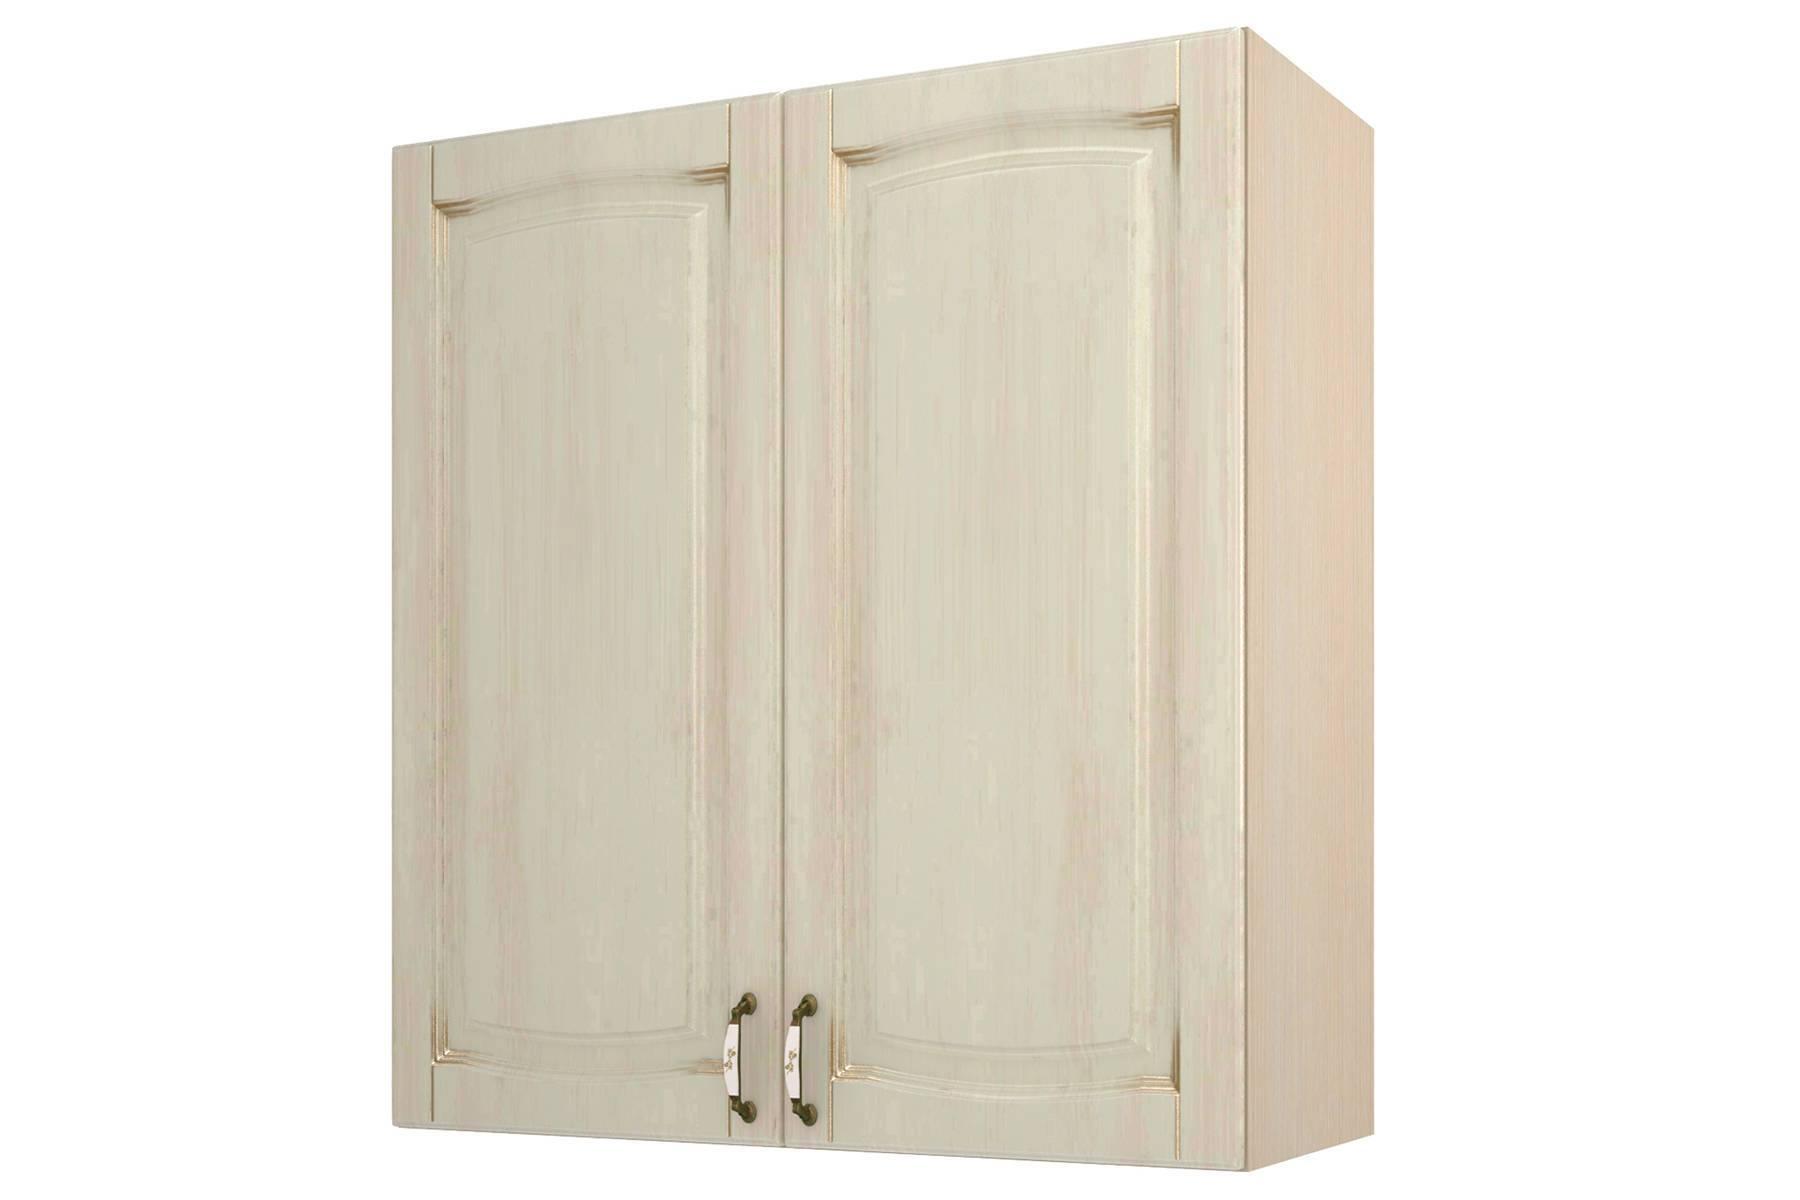 Равенна шкаф навесной 90, Н-96 набор отвёрток 6 шт s2 gross 12164